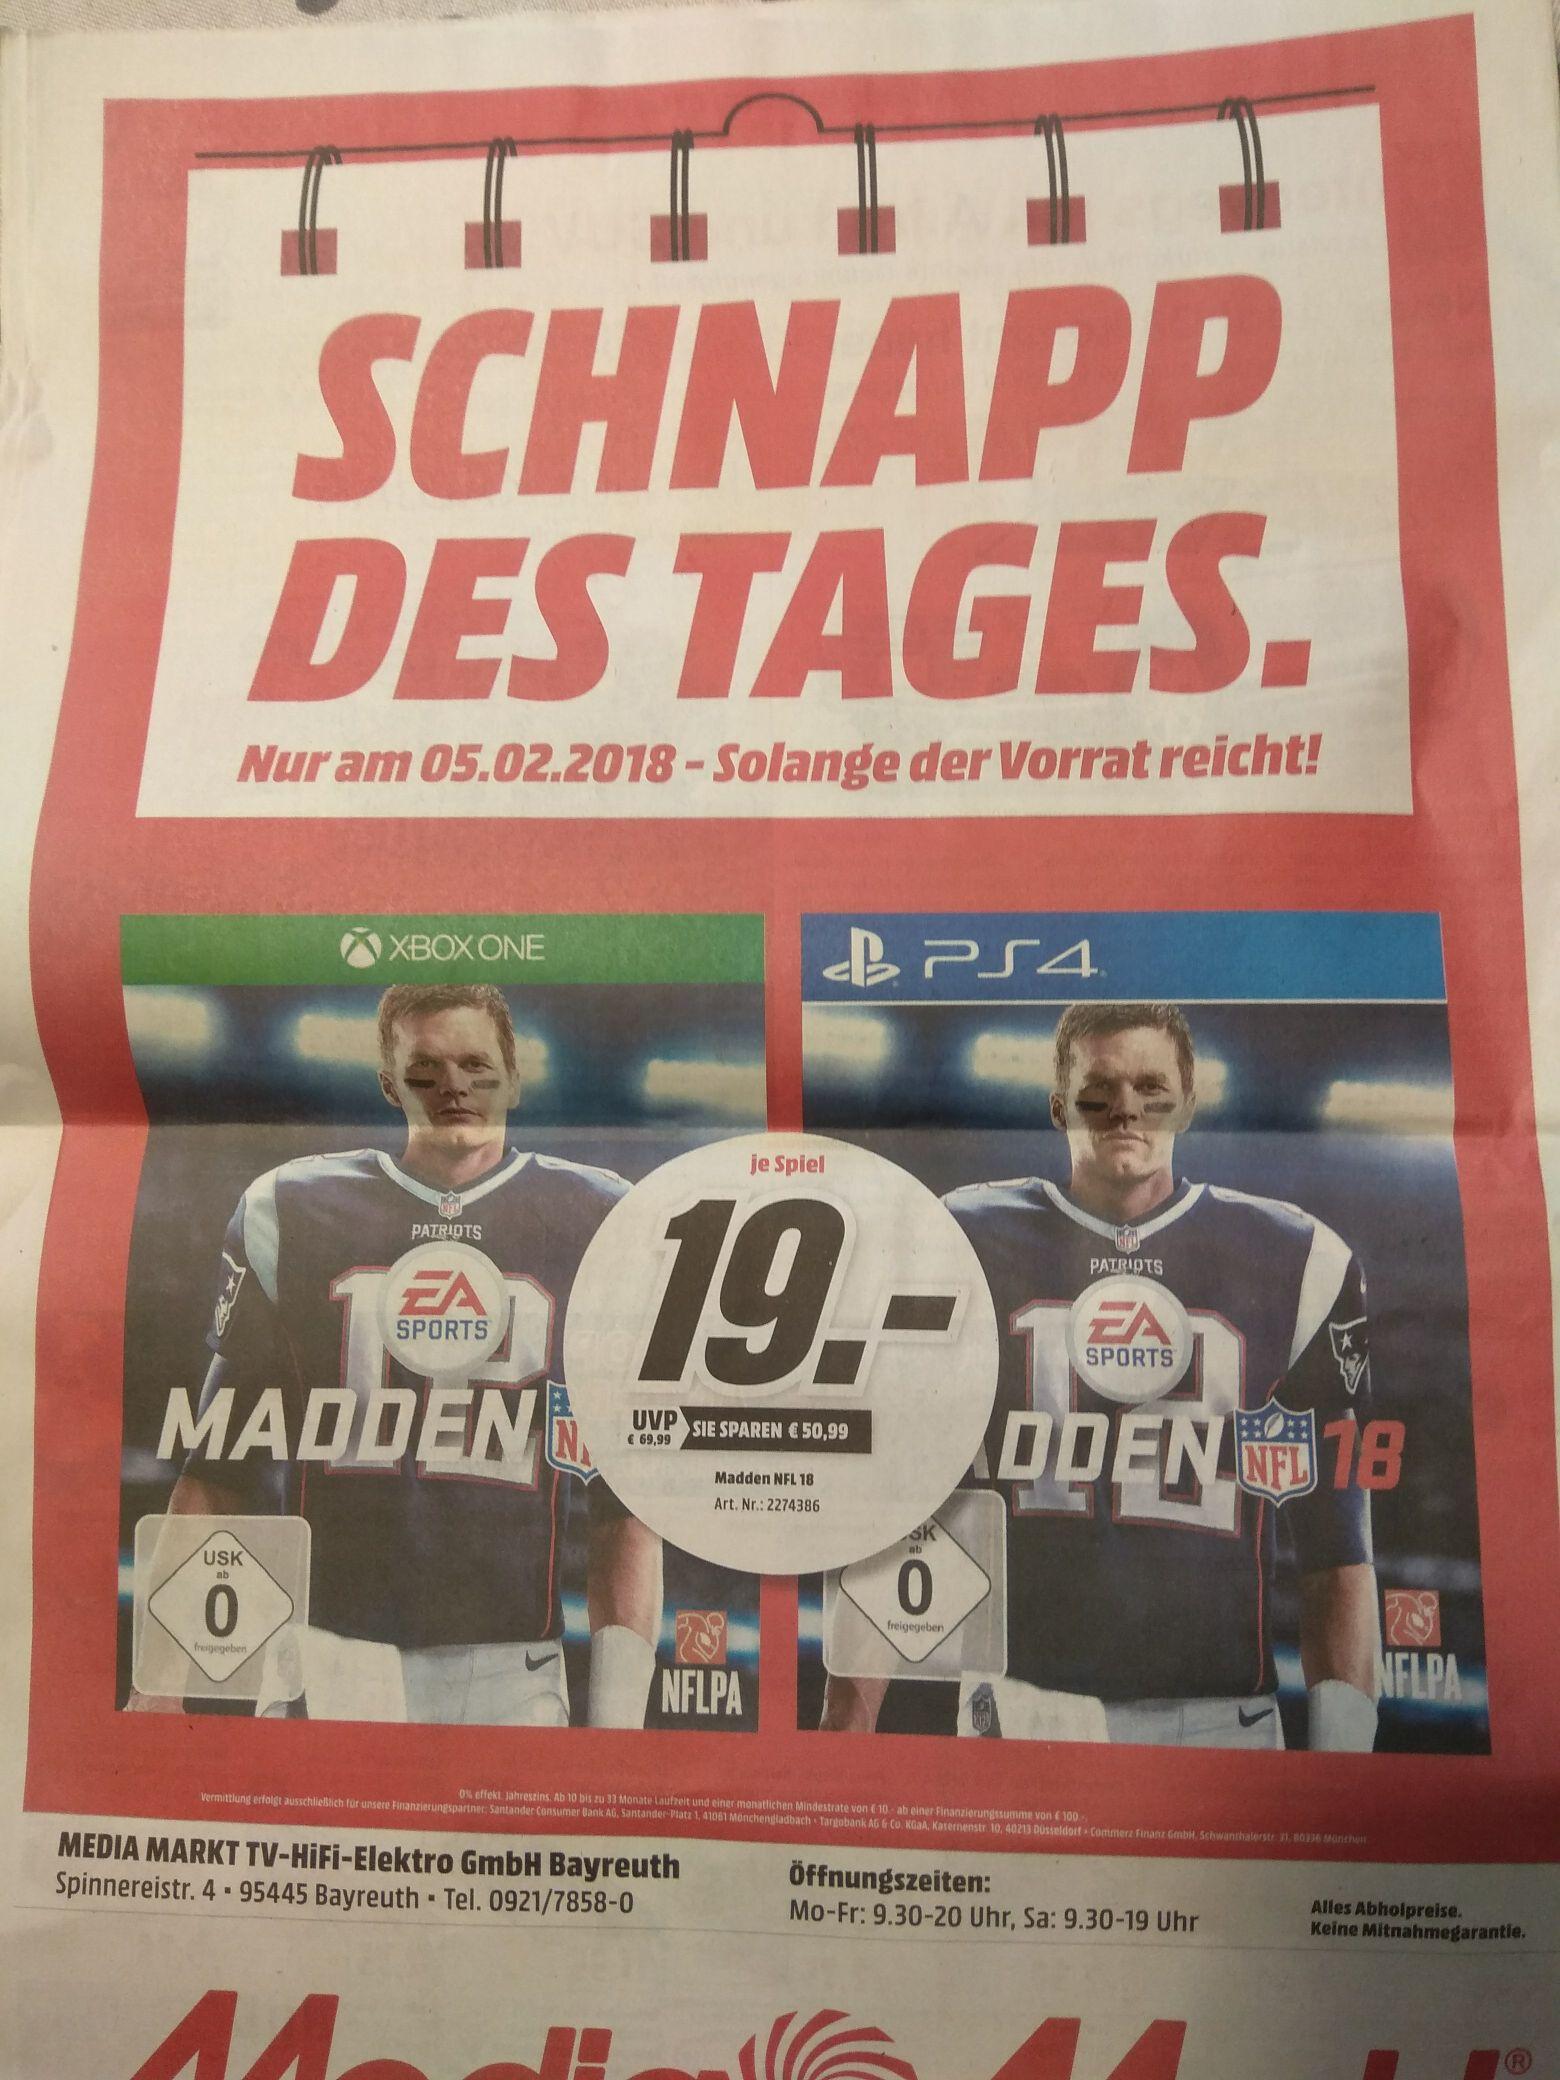 Madden NFL 18 XBOX ONE / PS4 für je 19 Euro [lokal Media Markt Bayreuth]